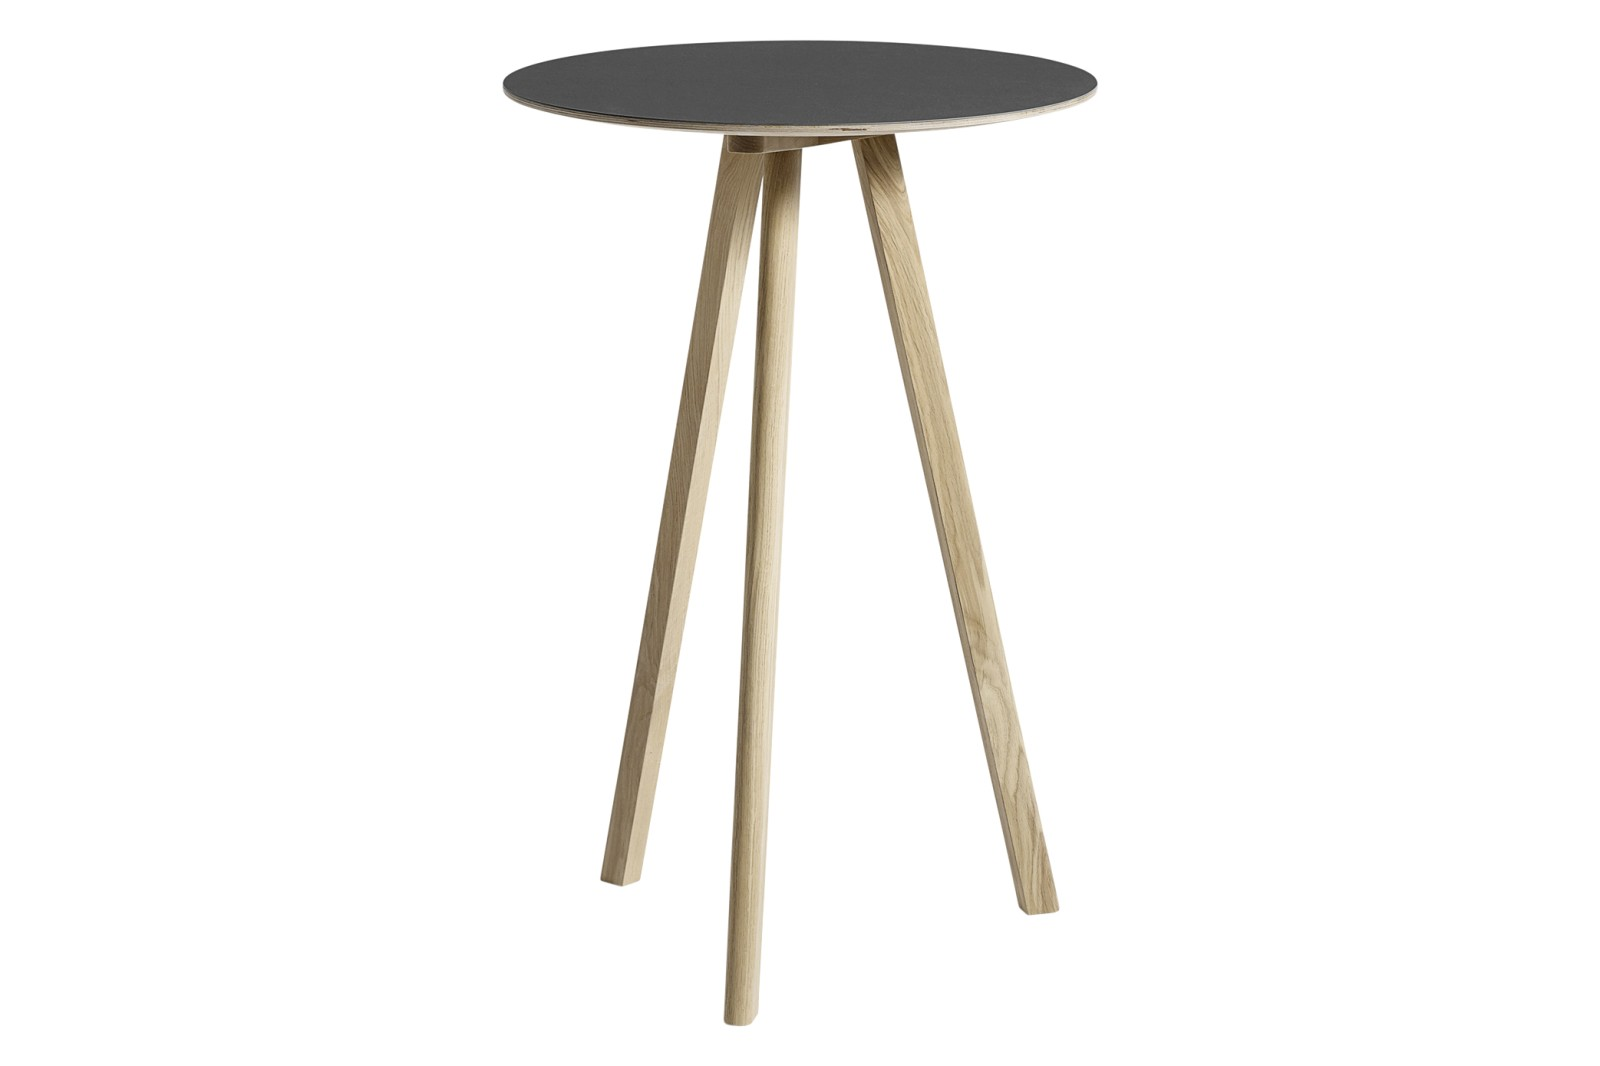 CPH 20 Round High Table Linoleum Black / Wood Matt Oak